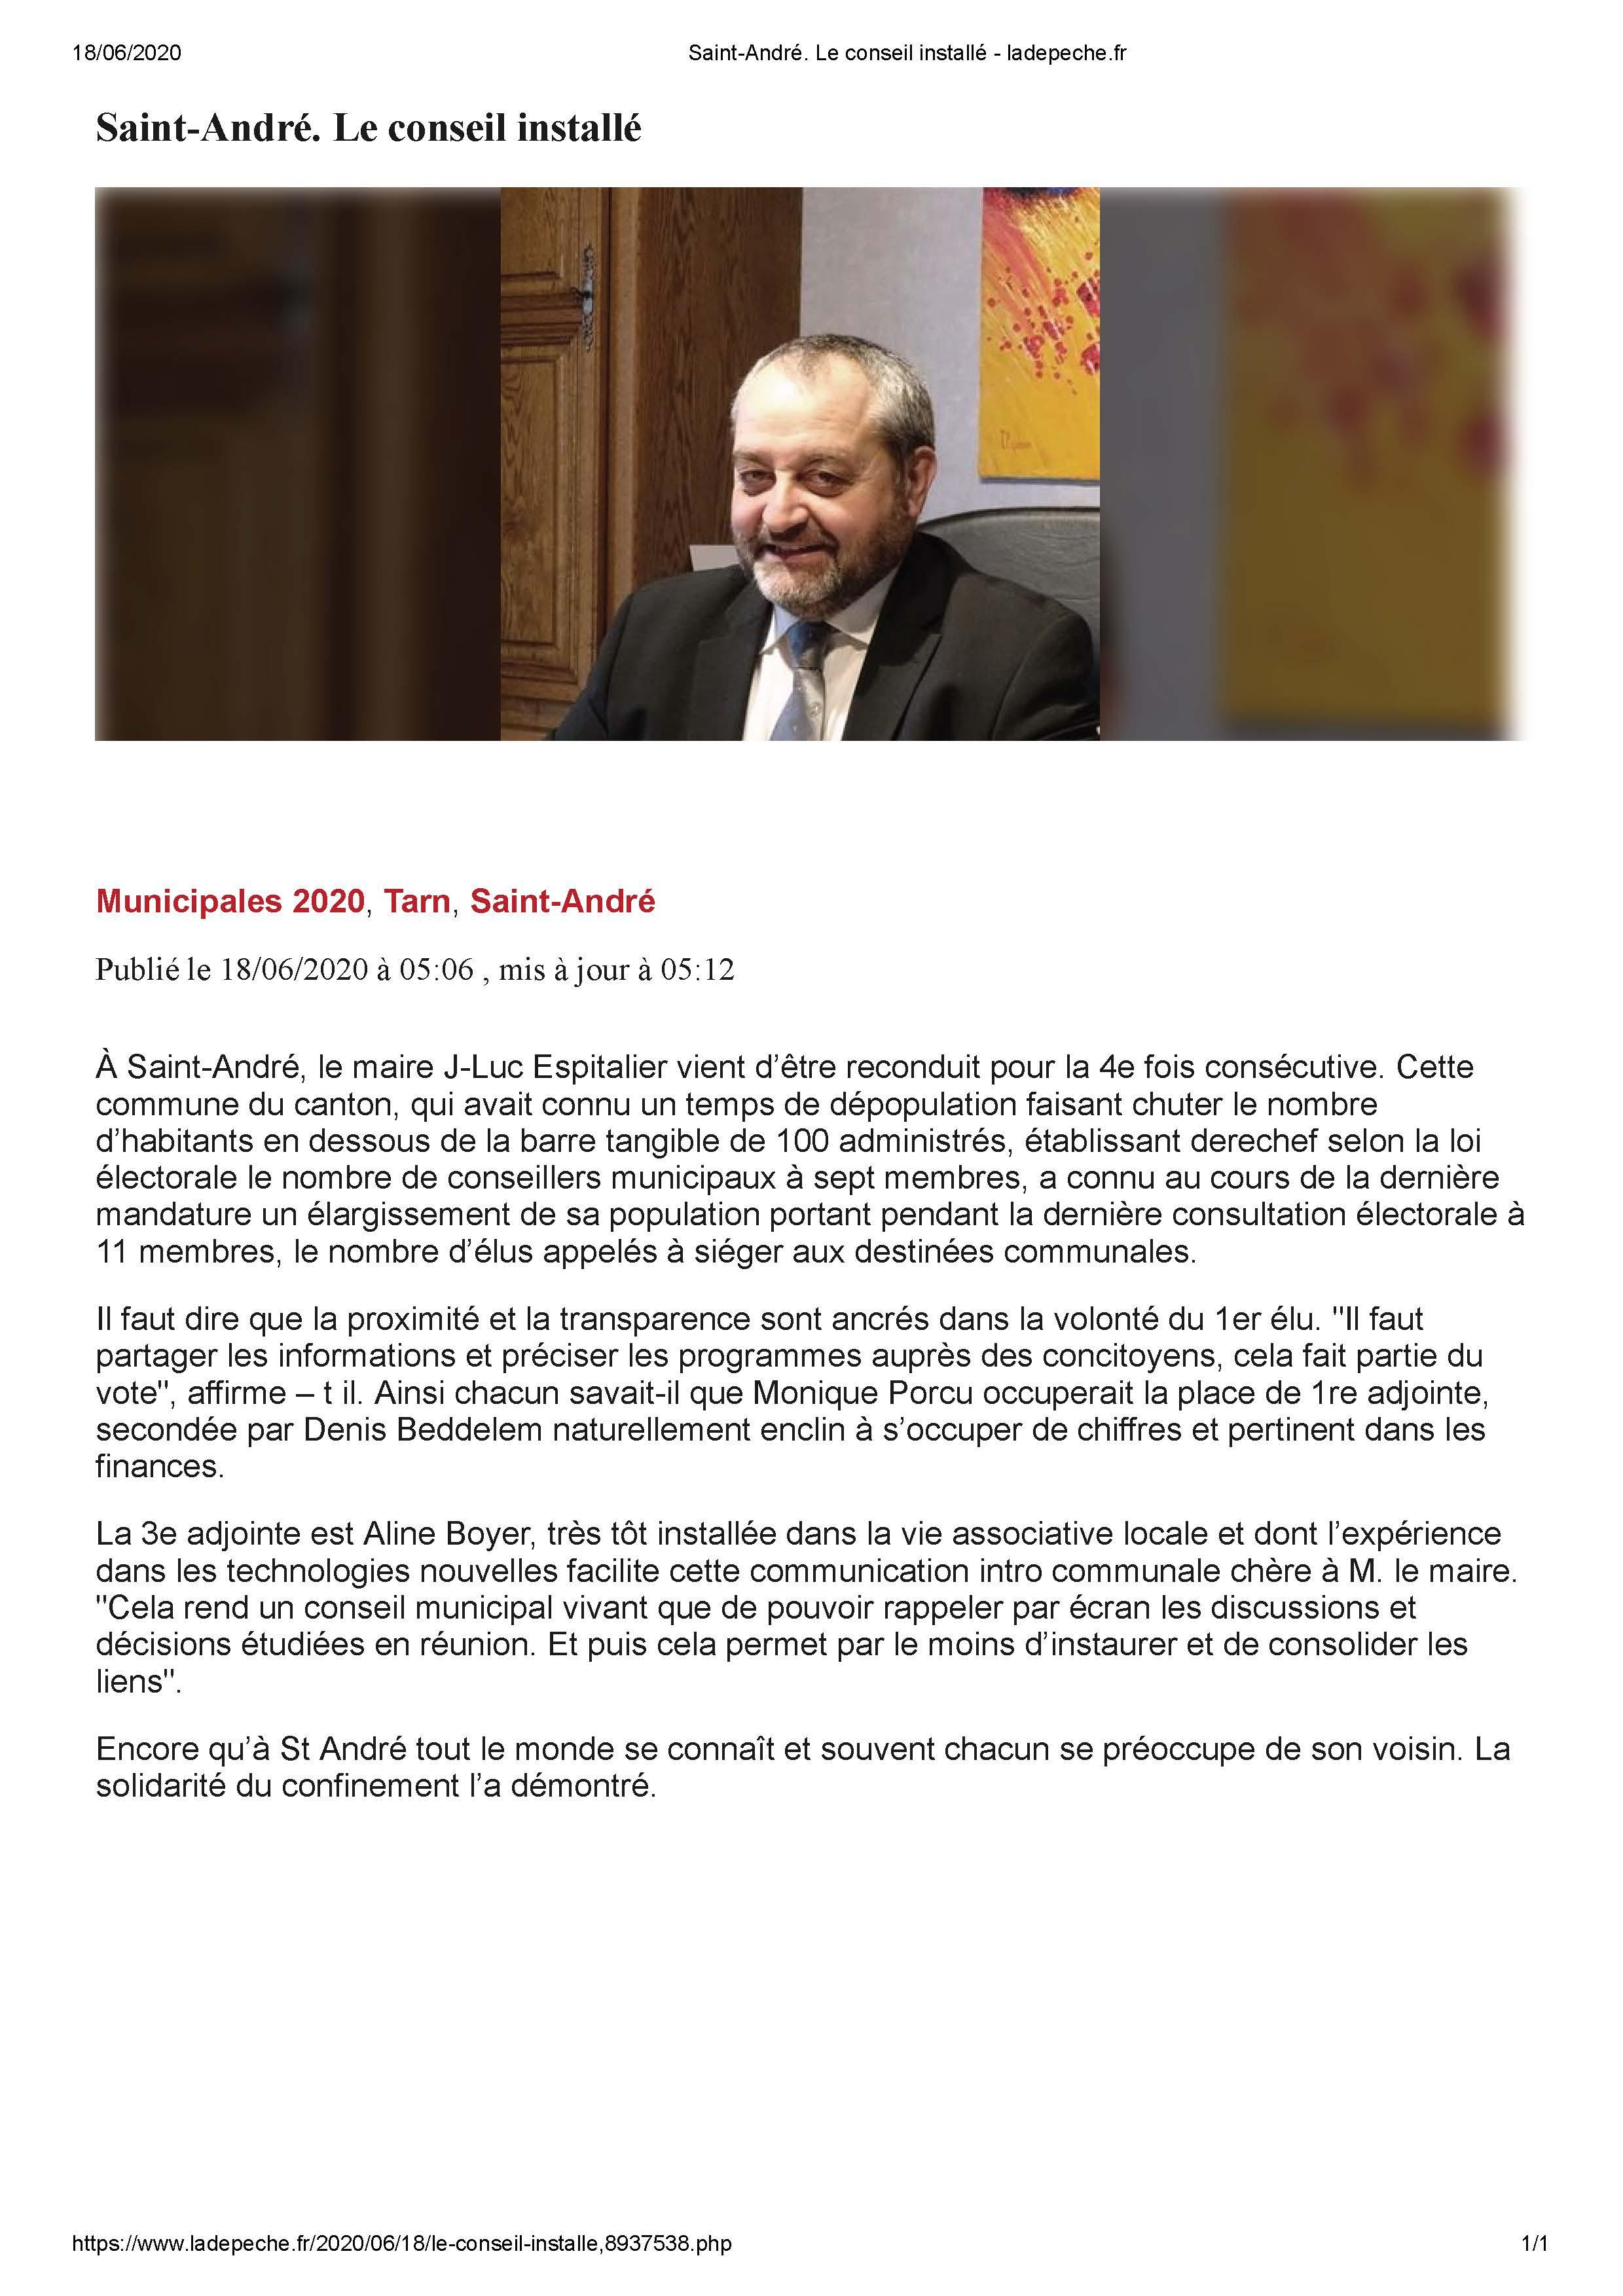 r4681_9_saint-andre._le_conseil_installe_-_ladepeche.fr-2.jpg